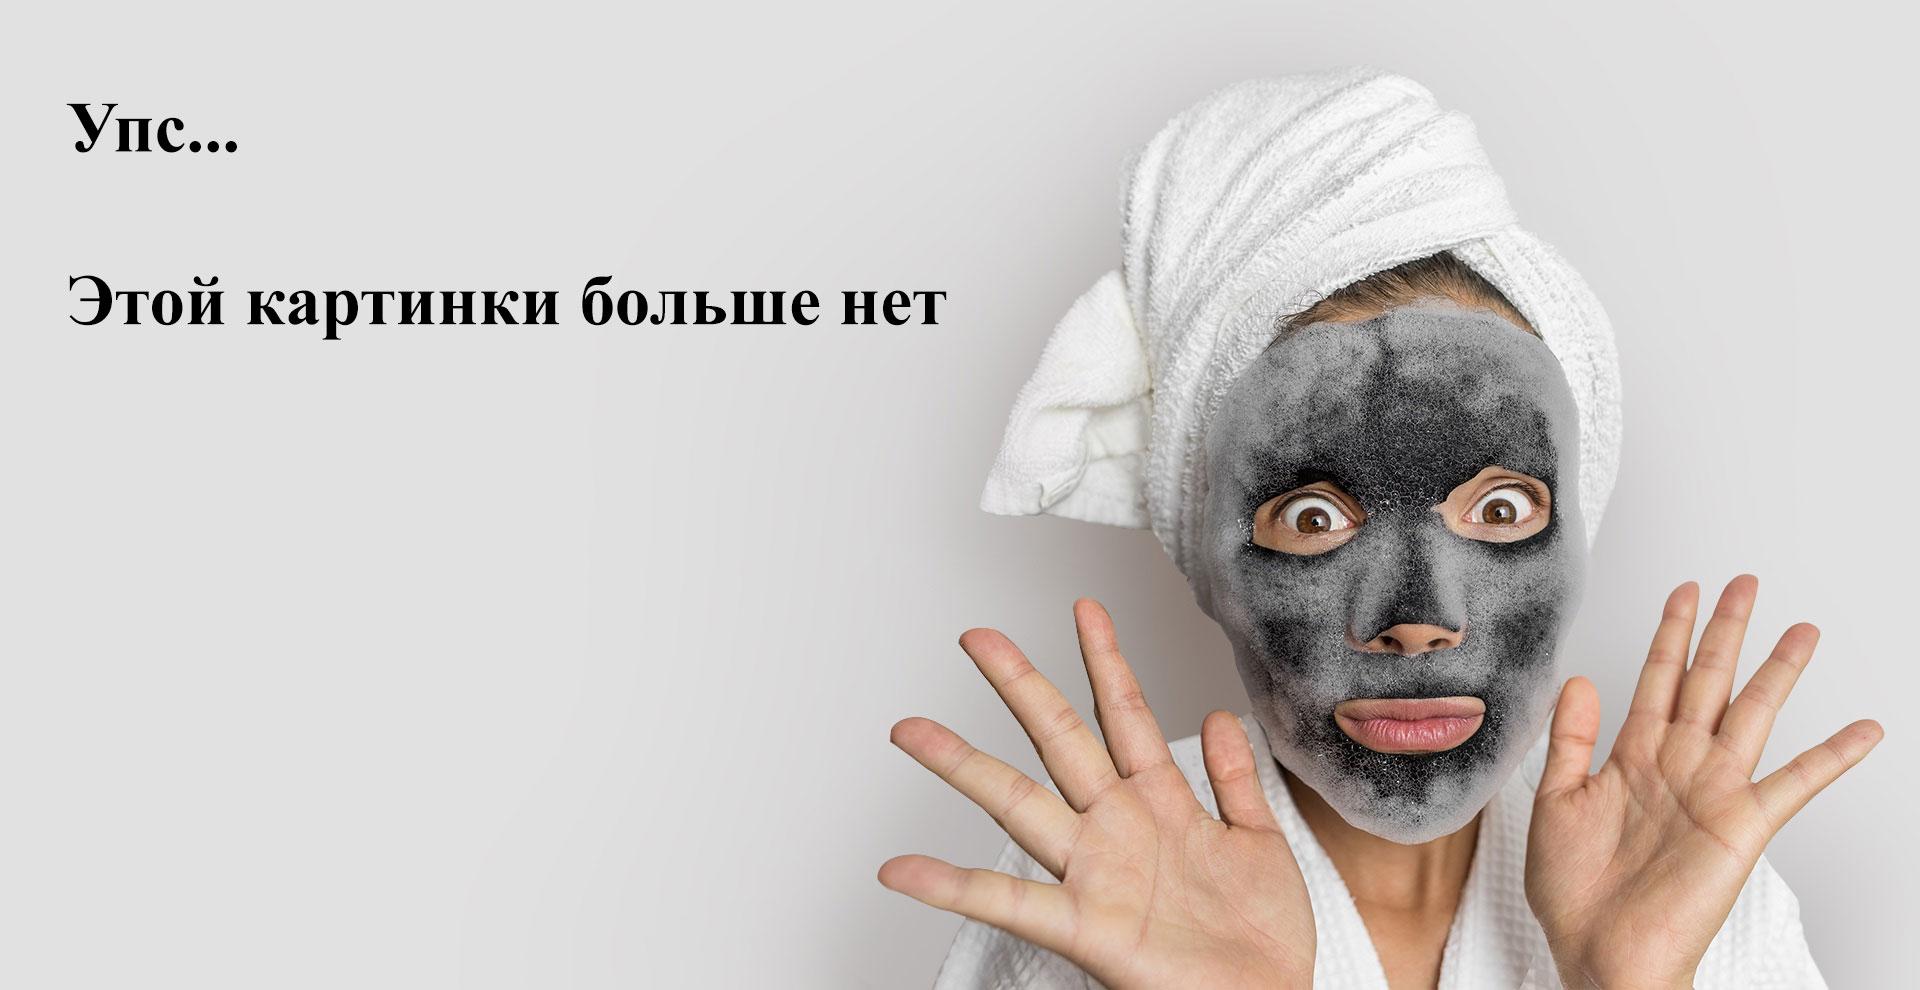 Staleks, Терка для стоп Beauty/Care 12/3, пластиковая, 180